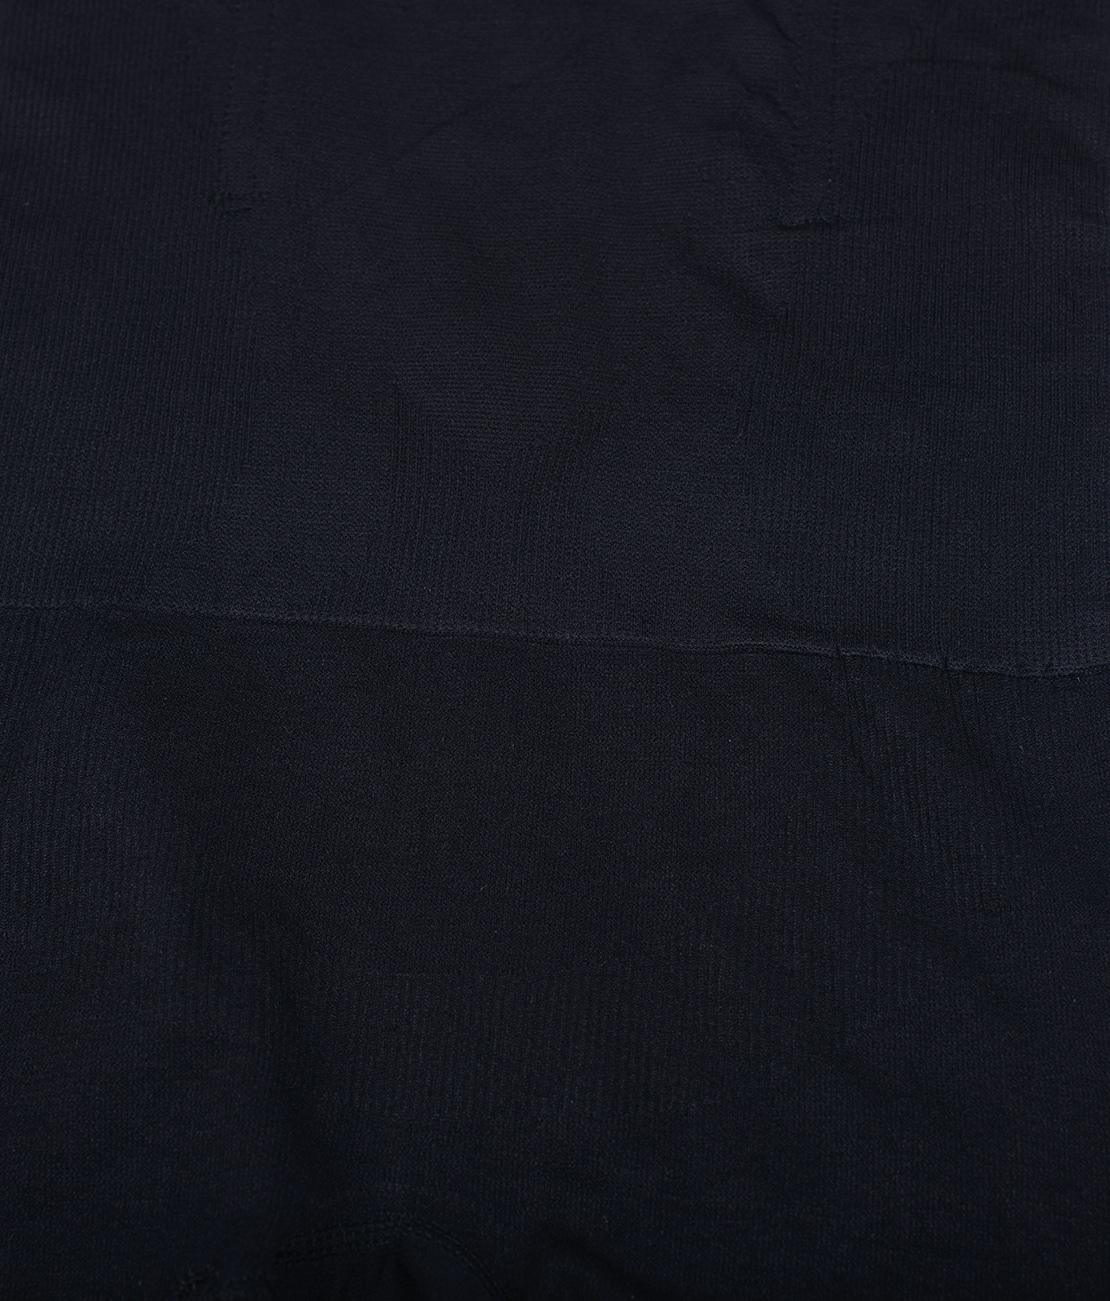 Panty Taille Haute Noir Packshot Detail 2